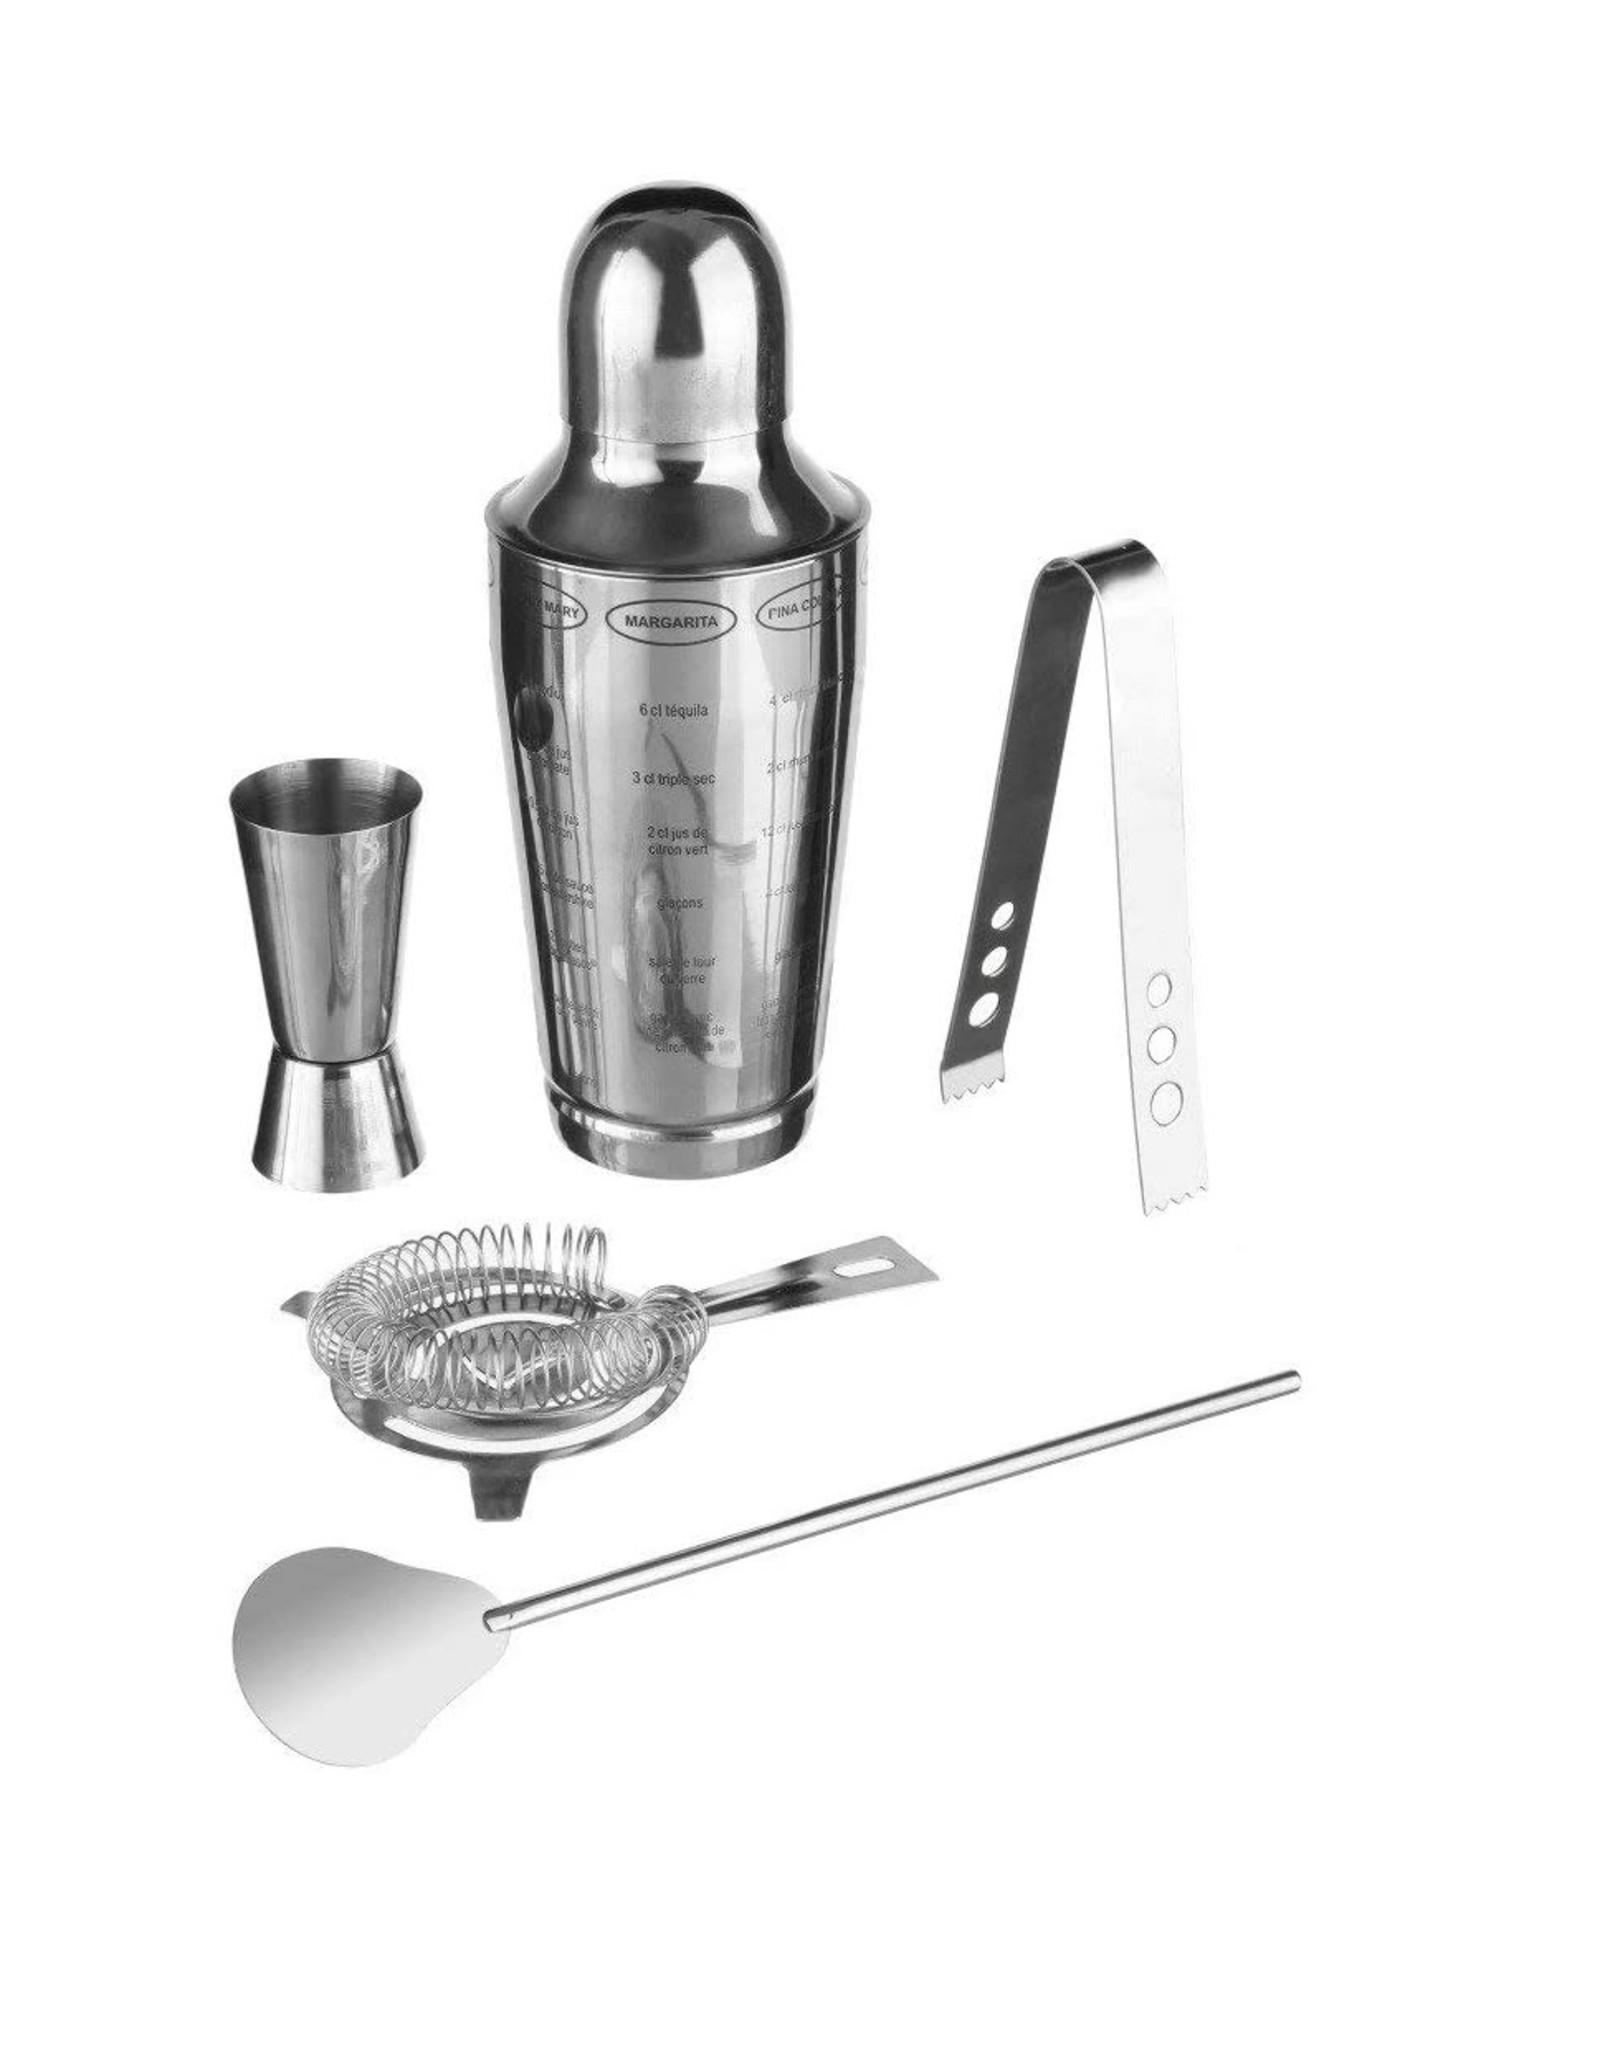 Secret de Gourmet - Cocktailset - Cocktailshaker - Roestvrijstaal - 600ml Shaker - 5 delig